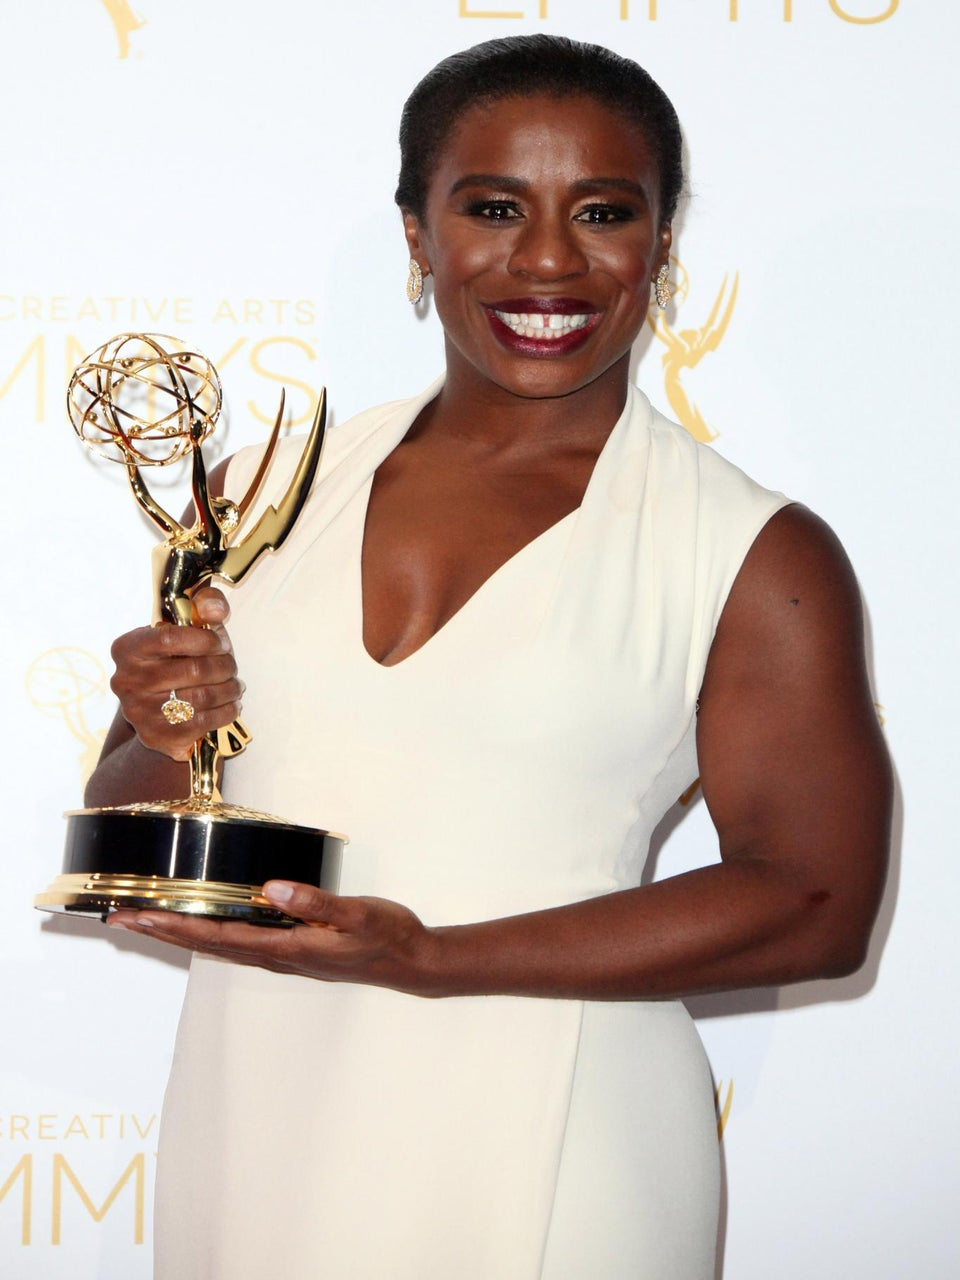 'Orange is the New Black' Star Uzo Aduba and 'Scandal' Star Joe Morton Take Home Emmys